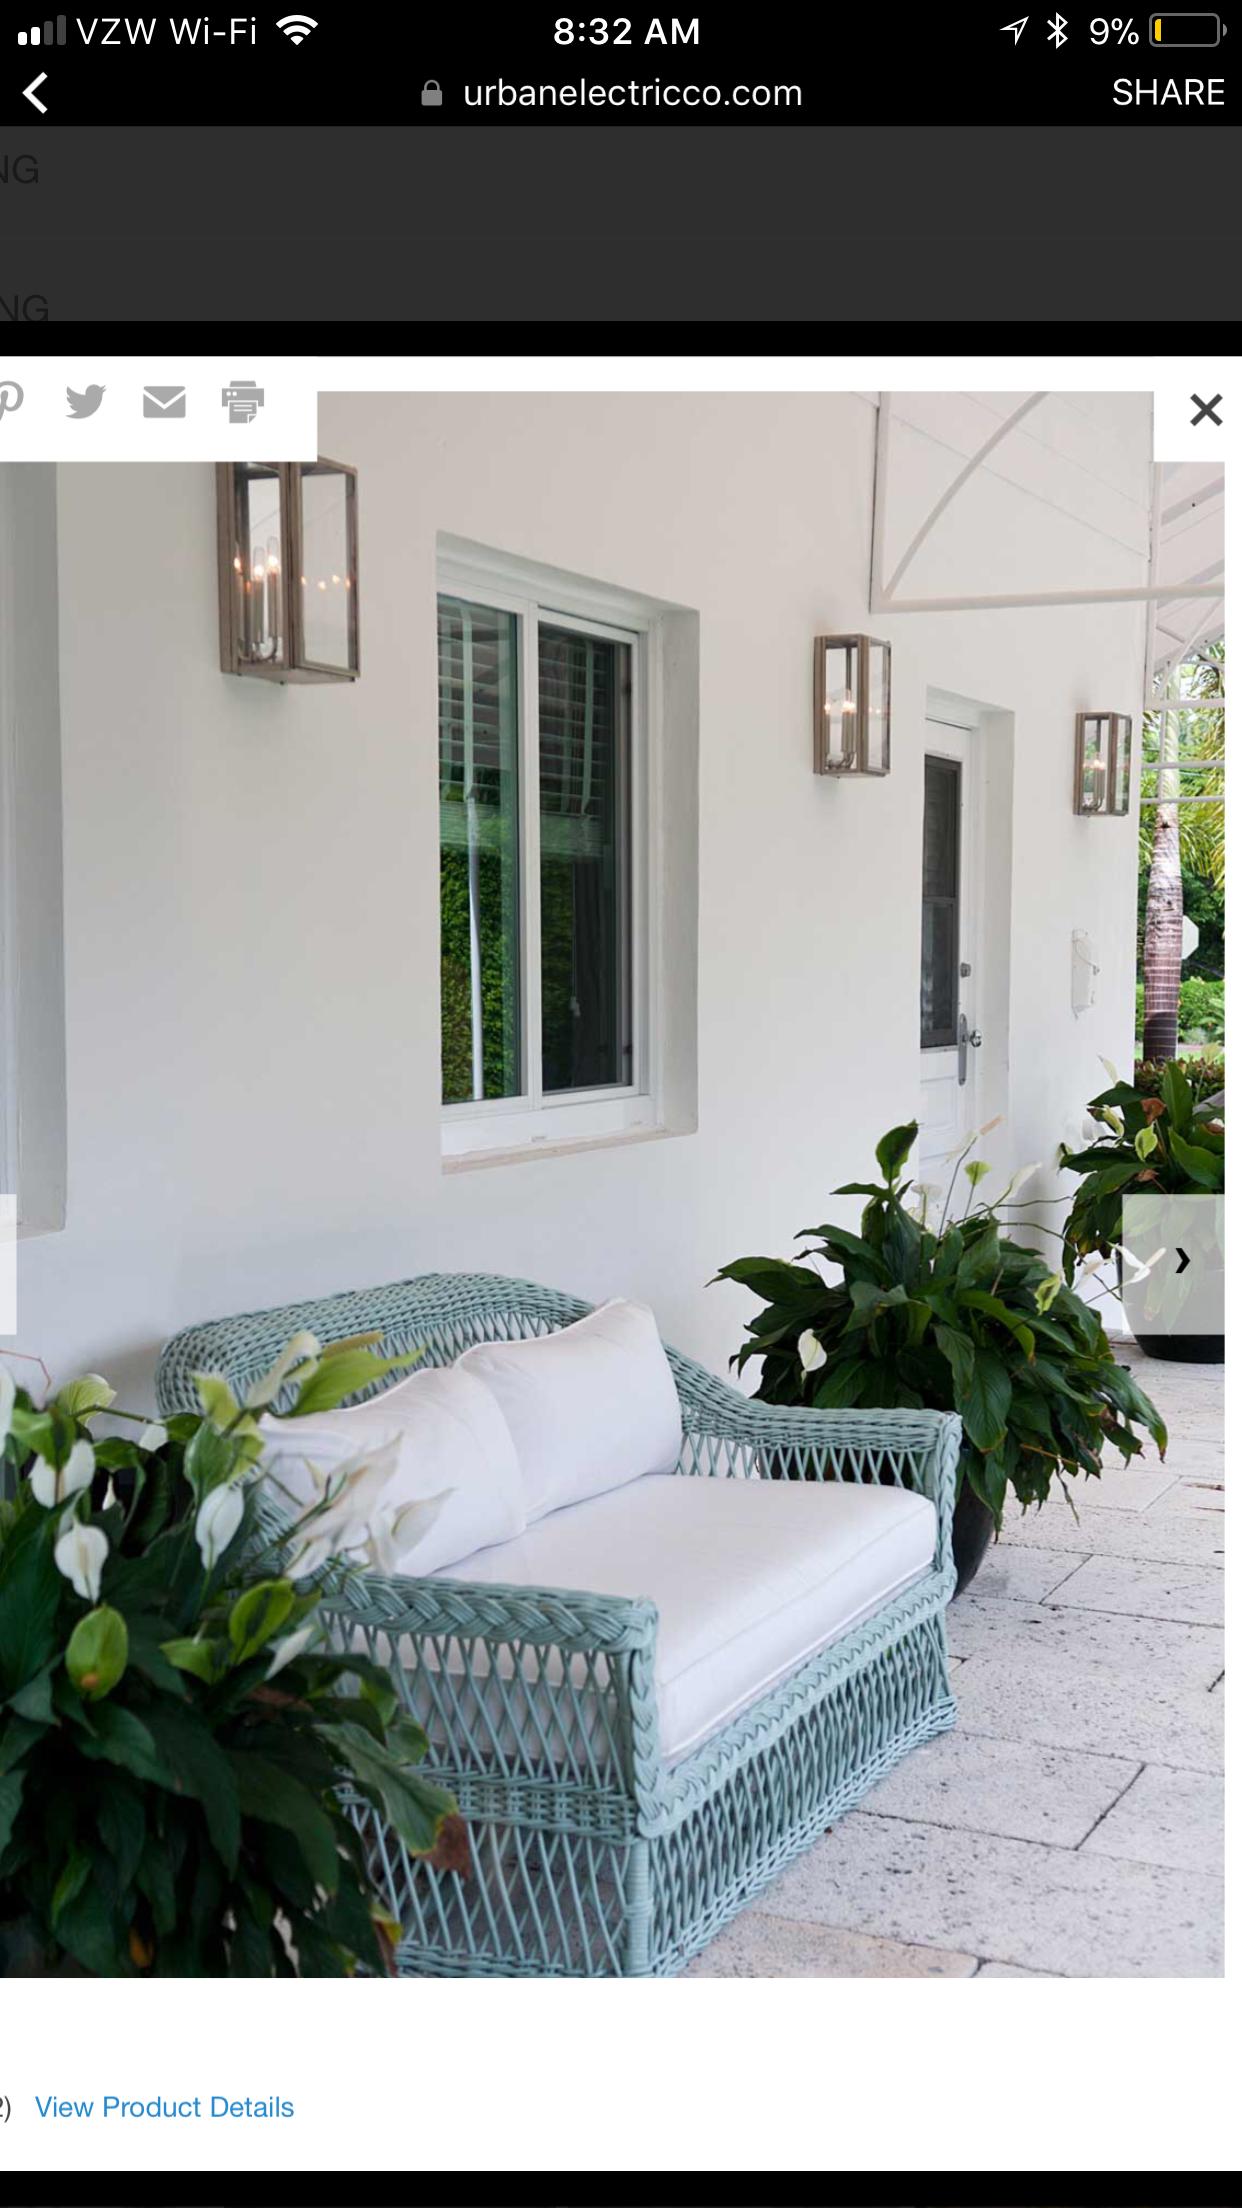 agrandir sa maison pas cher beautiful agrandir sa maison sans permis de construire awesome. Black Bedroom Furniture Sets. Home Design Ideas